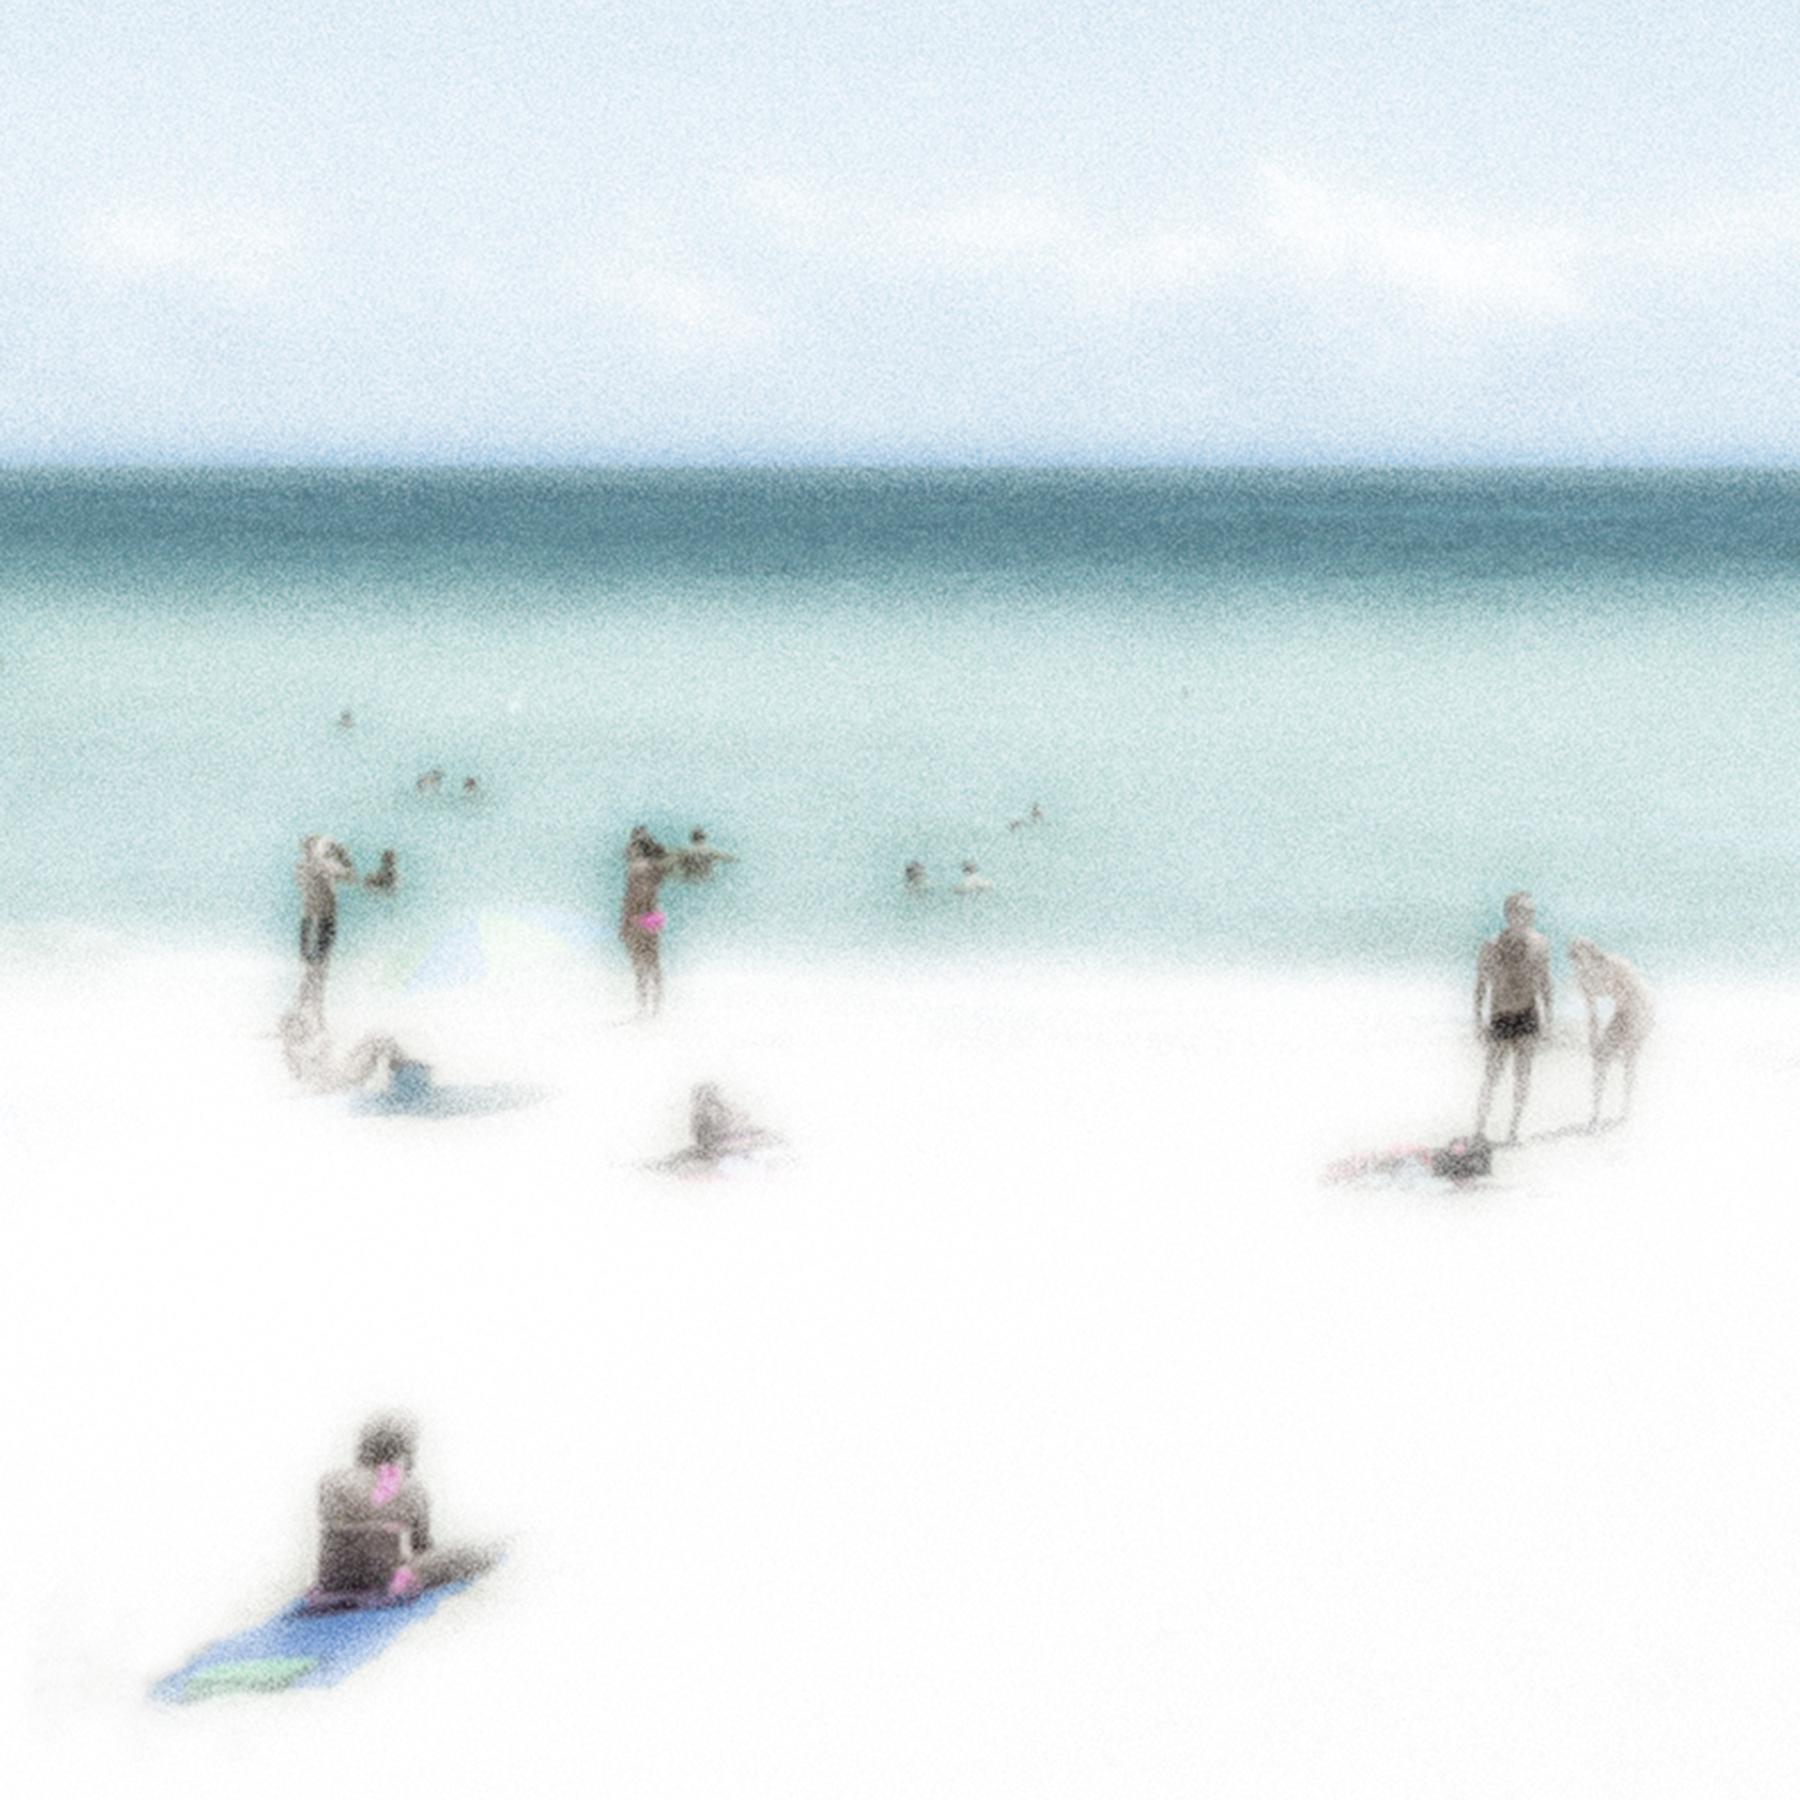 Dale_Johnson_Remembering Summer_On the Beach_1.jpg